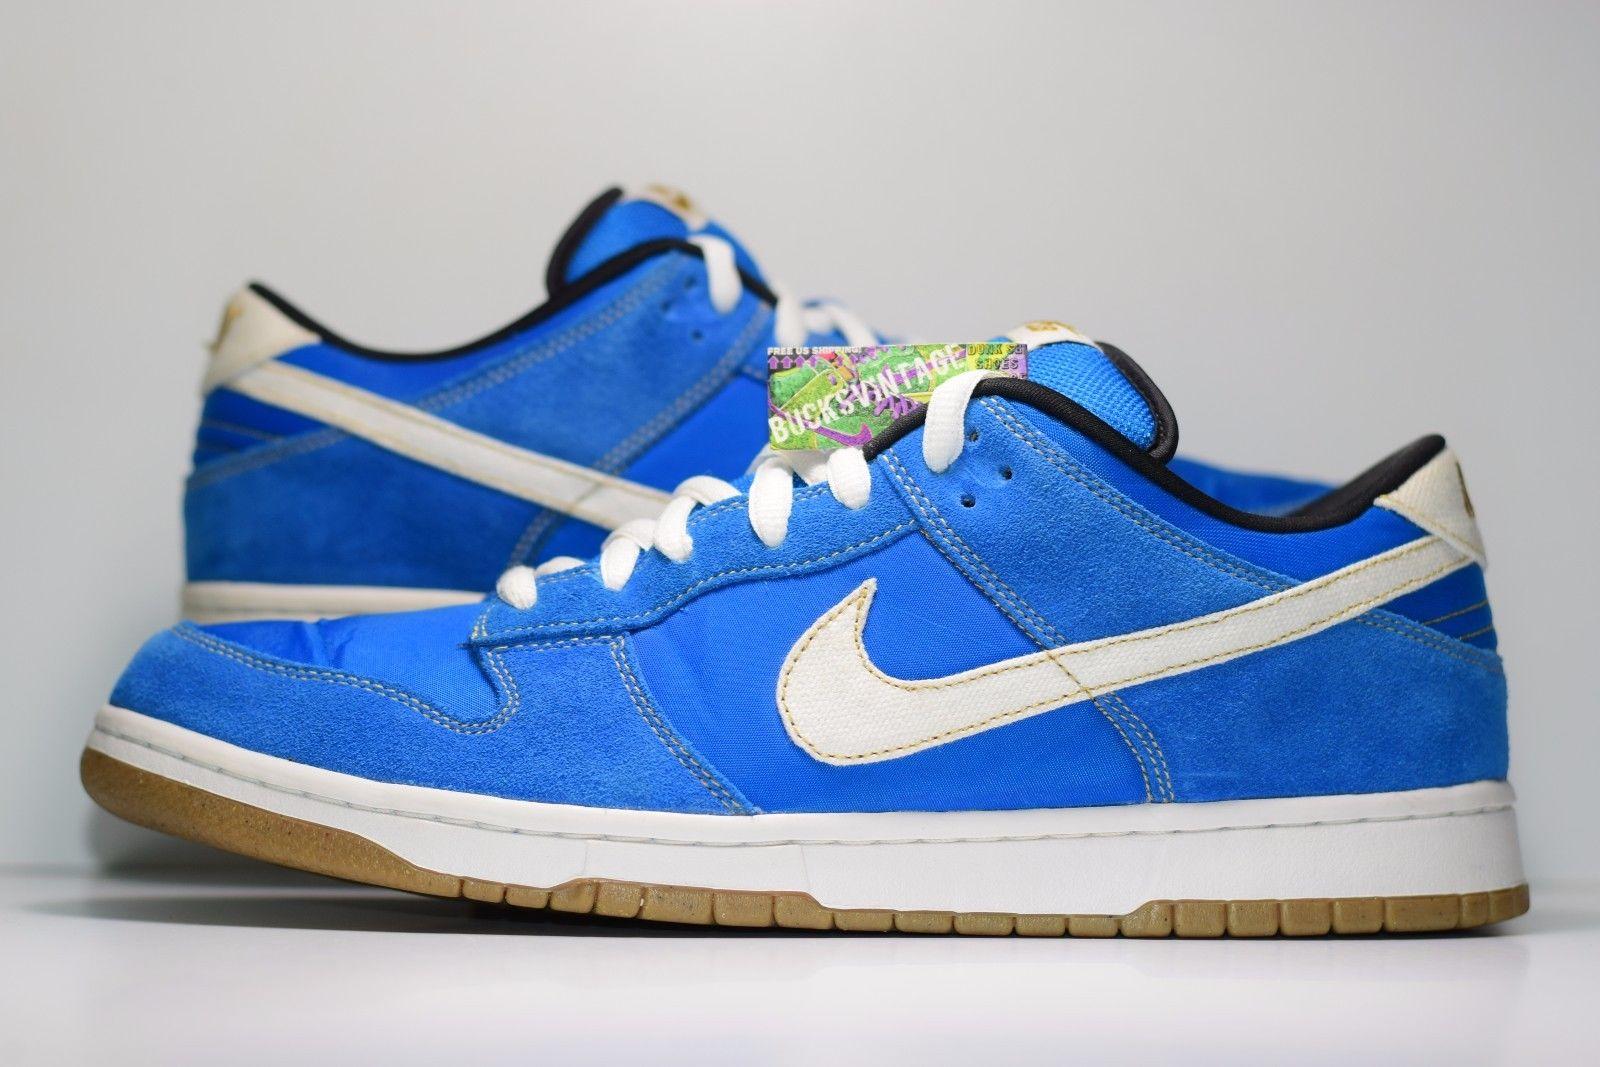 sports shoes d3ce0 8602a Size 13 | 2010 Nike Dunk SB CHUN LI Streetfighter argon blue/white 304292  405 from BucksVintage